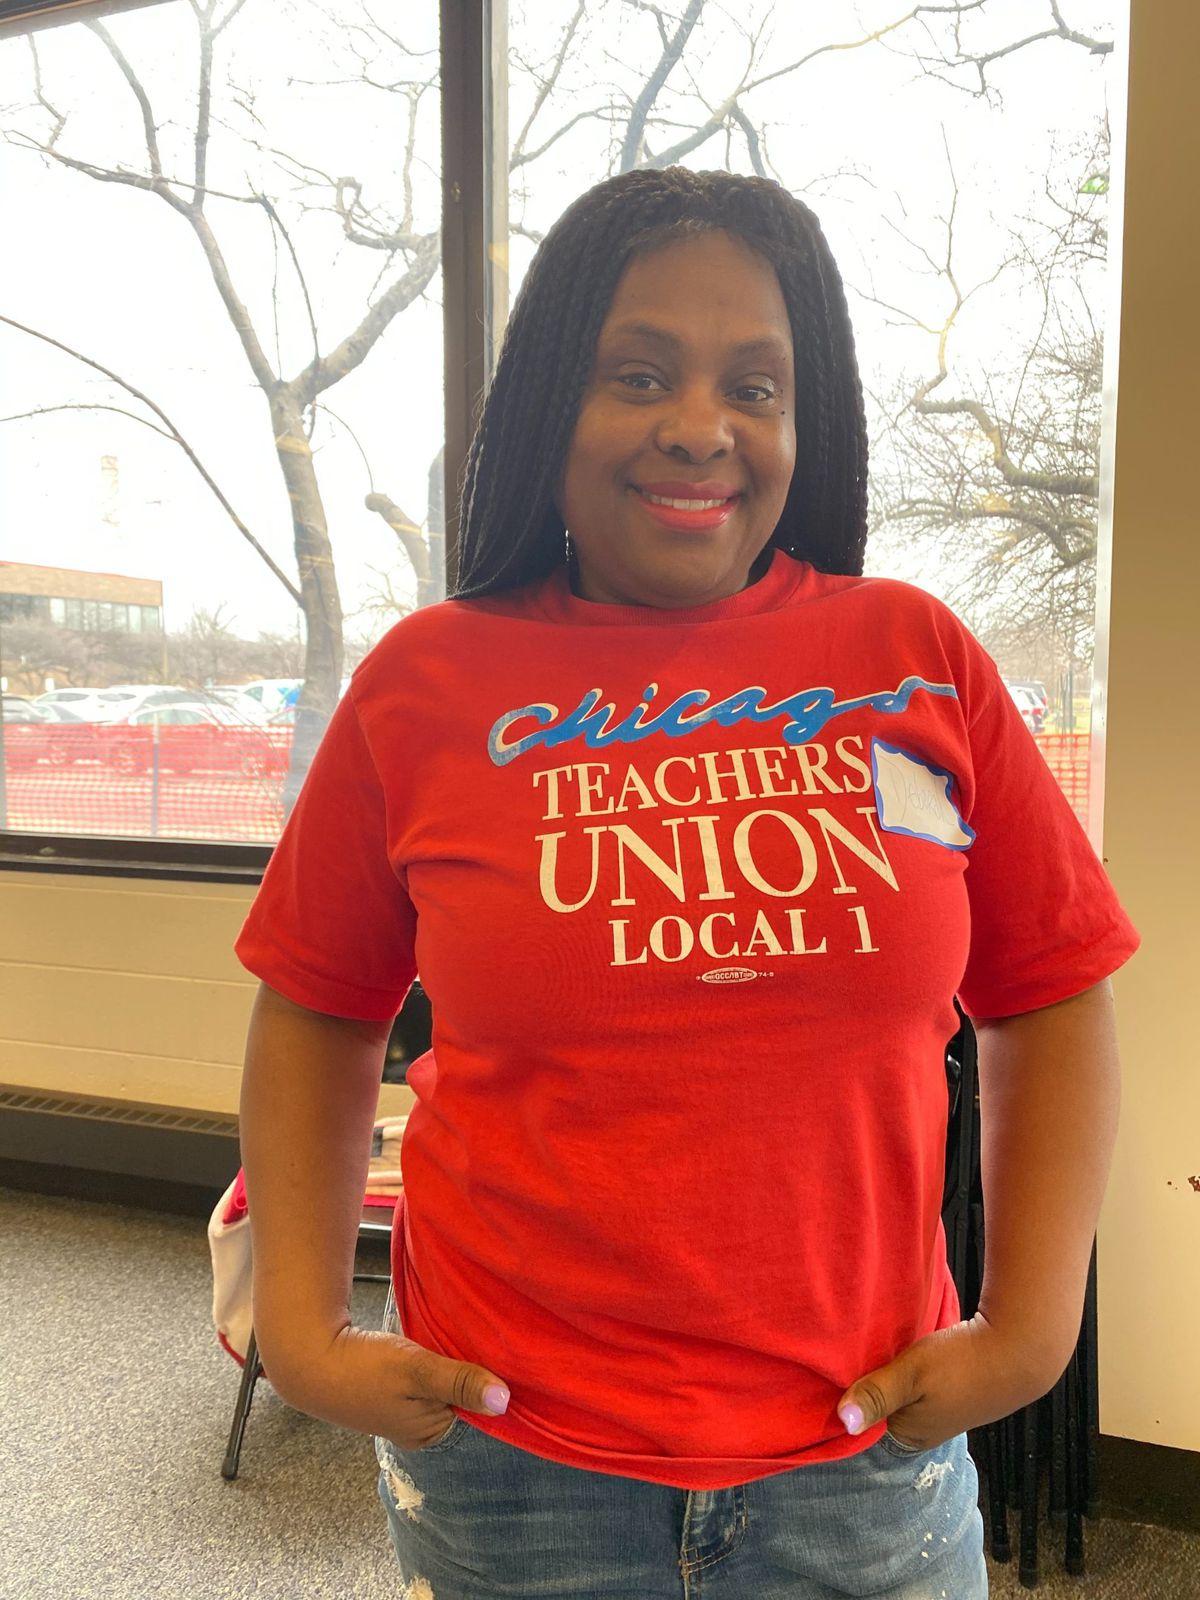 Deborah Riddel is a special education teacher at Charles W. Earle Stem Academy.